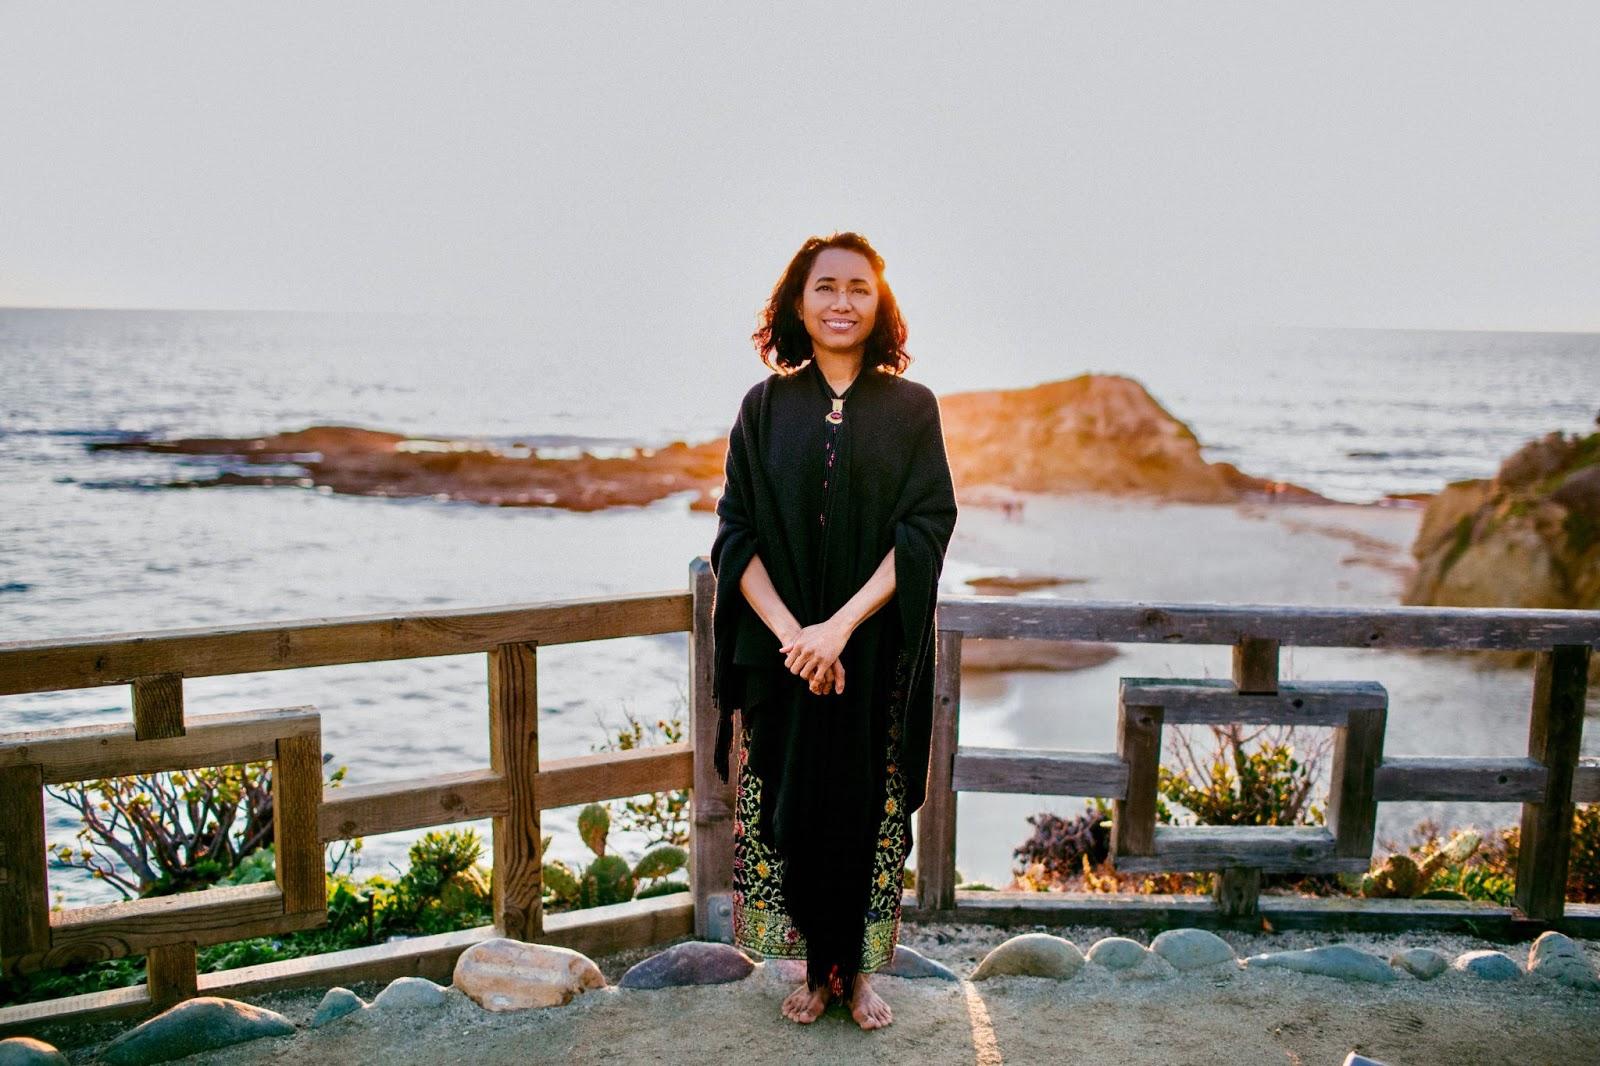 Maya the Shaman brings healing in new Documentary by Award Winning Filmmaker 1